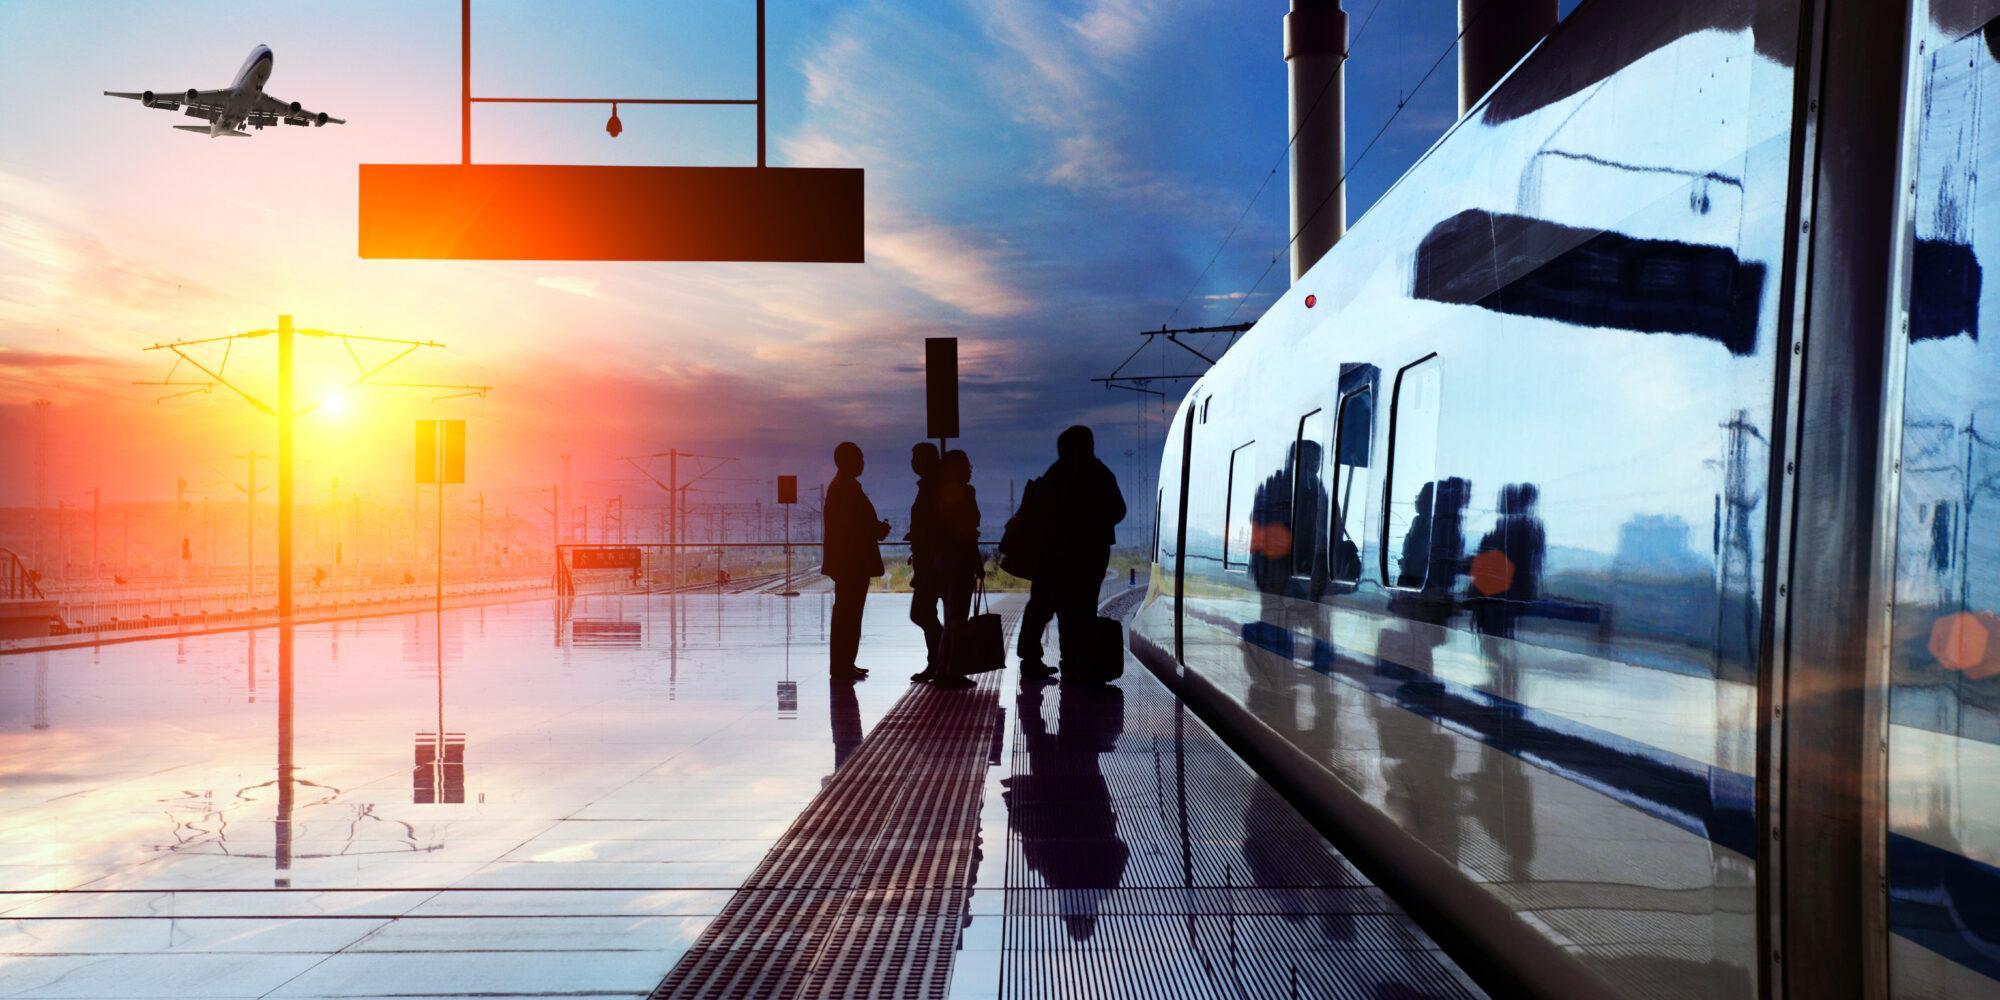 Auringonlasku juna-asemalla